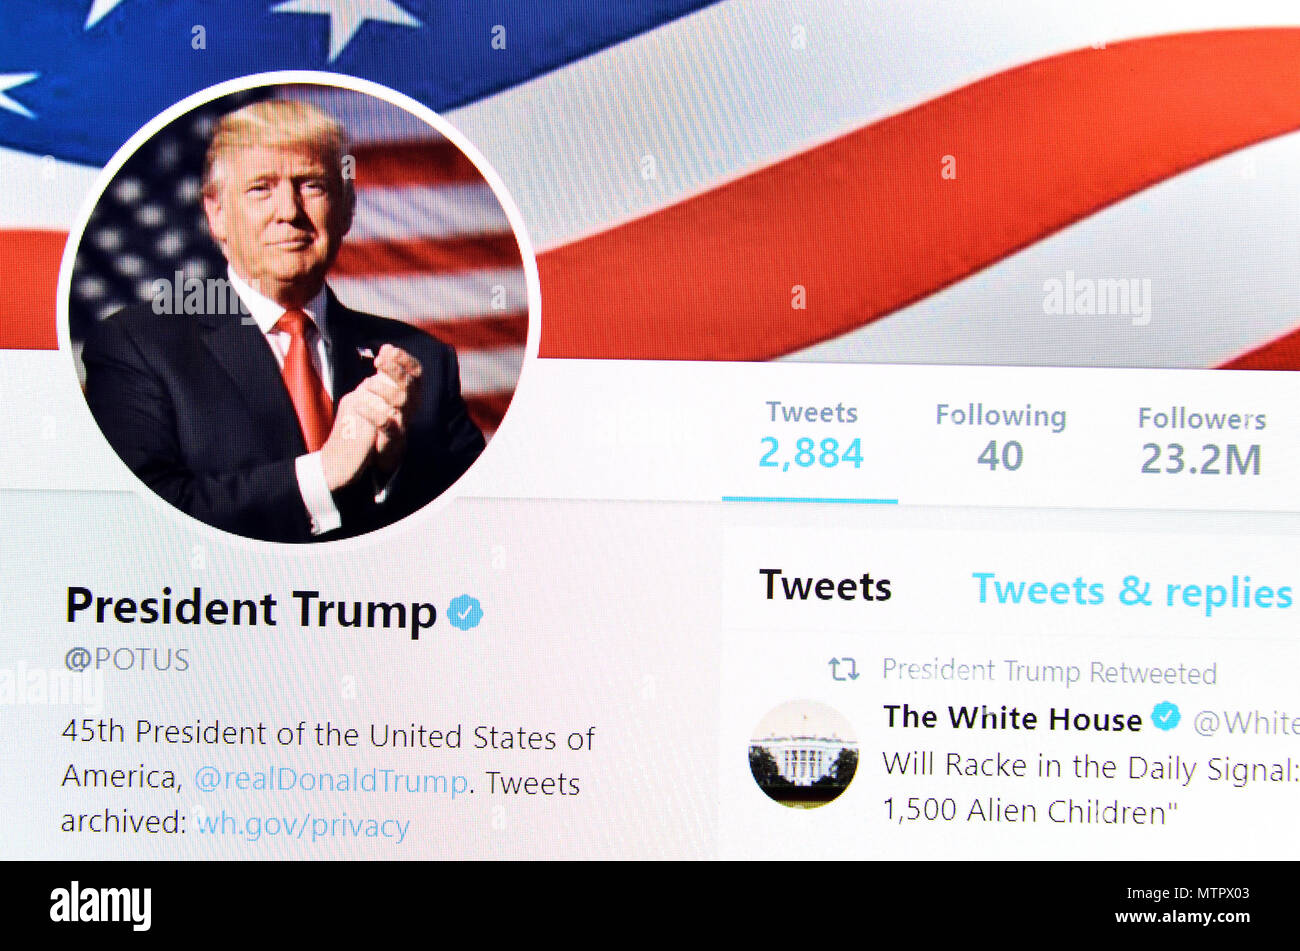 President Trump Potus Twitter Page 2018 Stock Photo Alamy